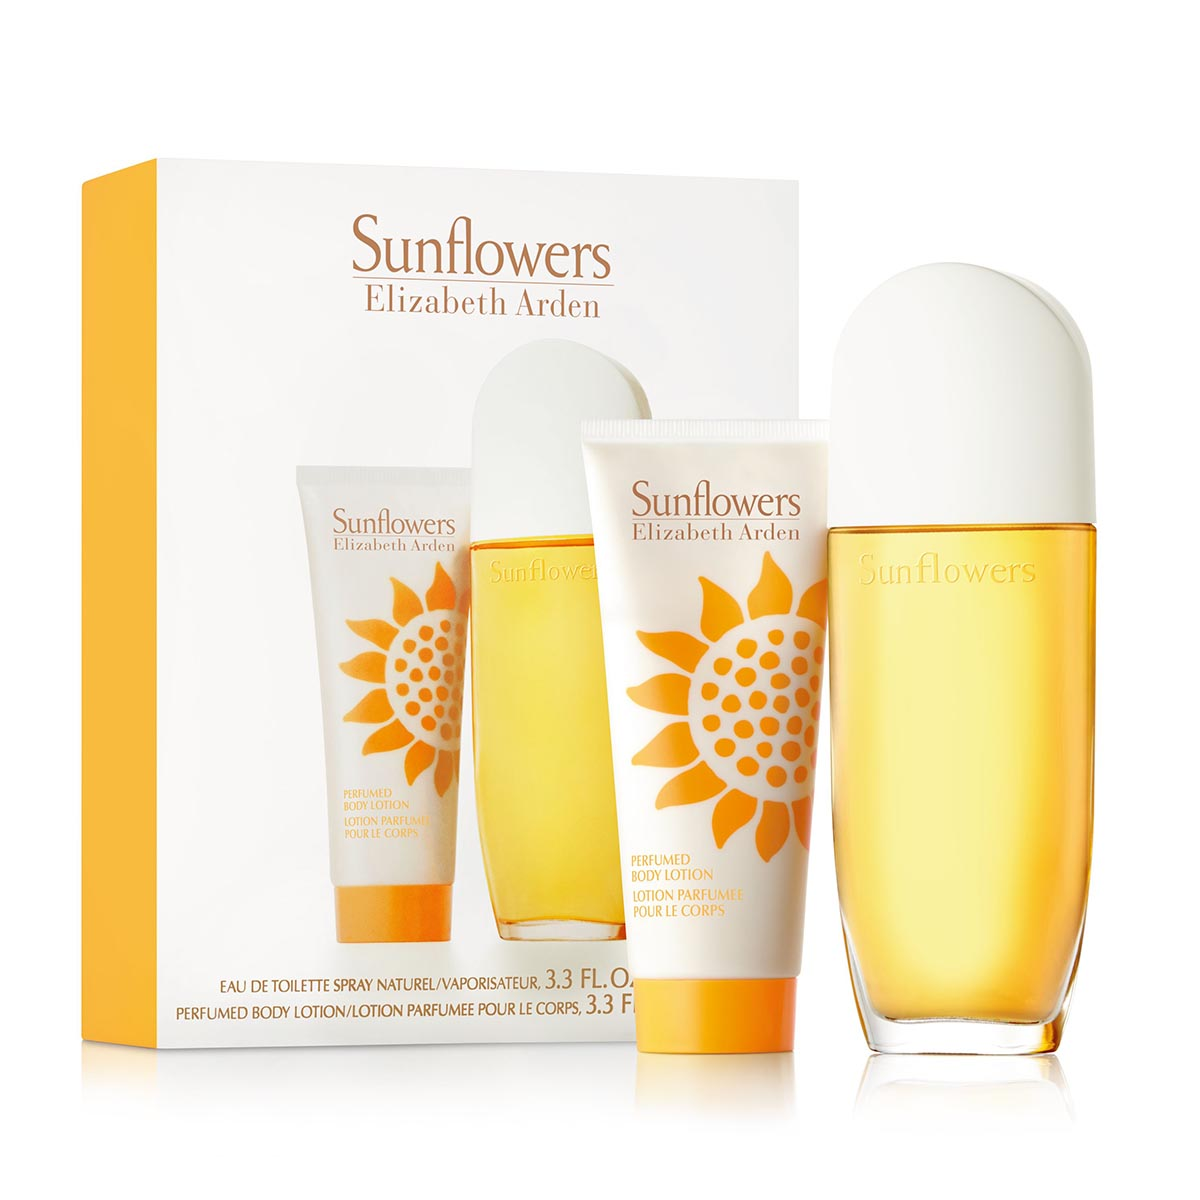 Elizabeth arden sunflowers eau de toilette 100ml vaporizador body milk 100ml